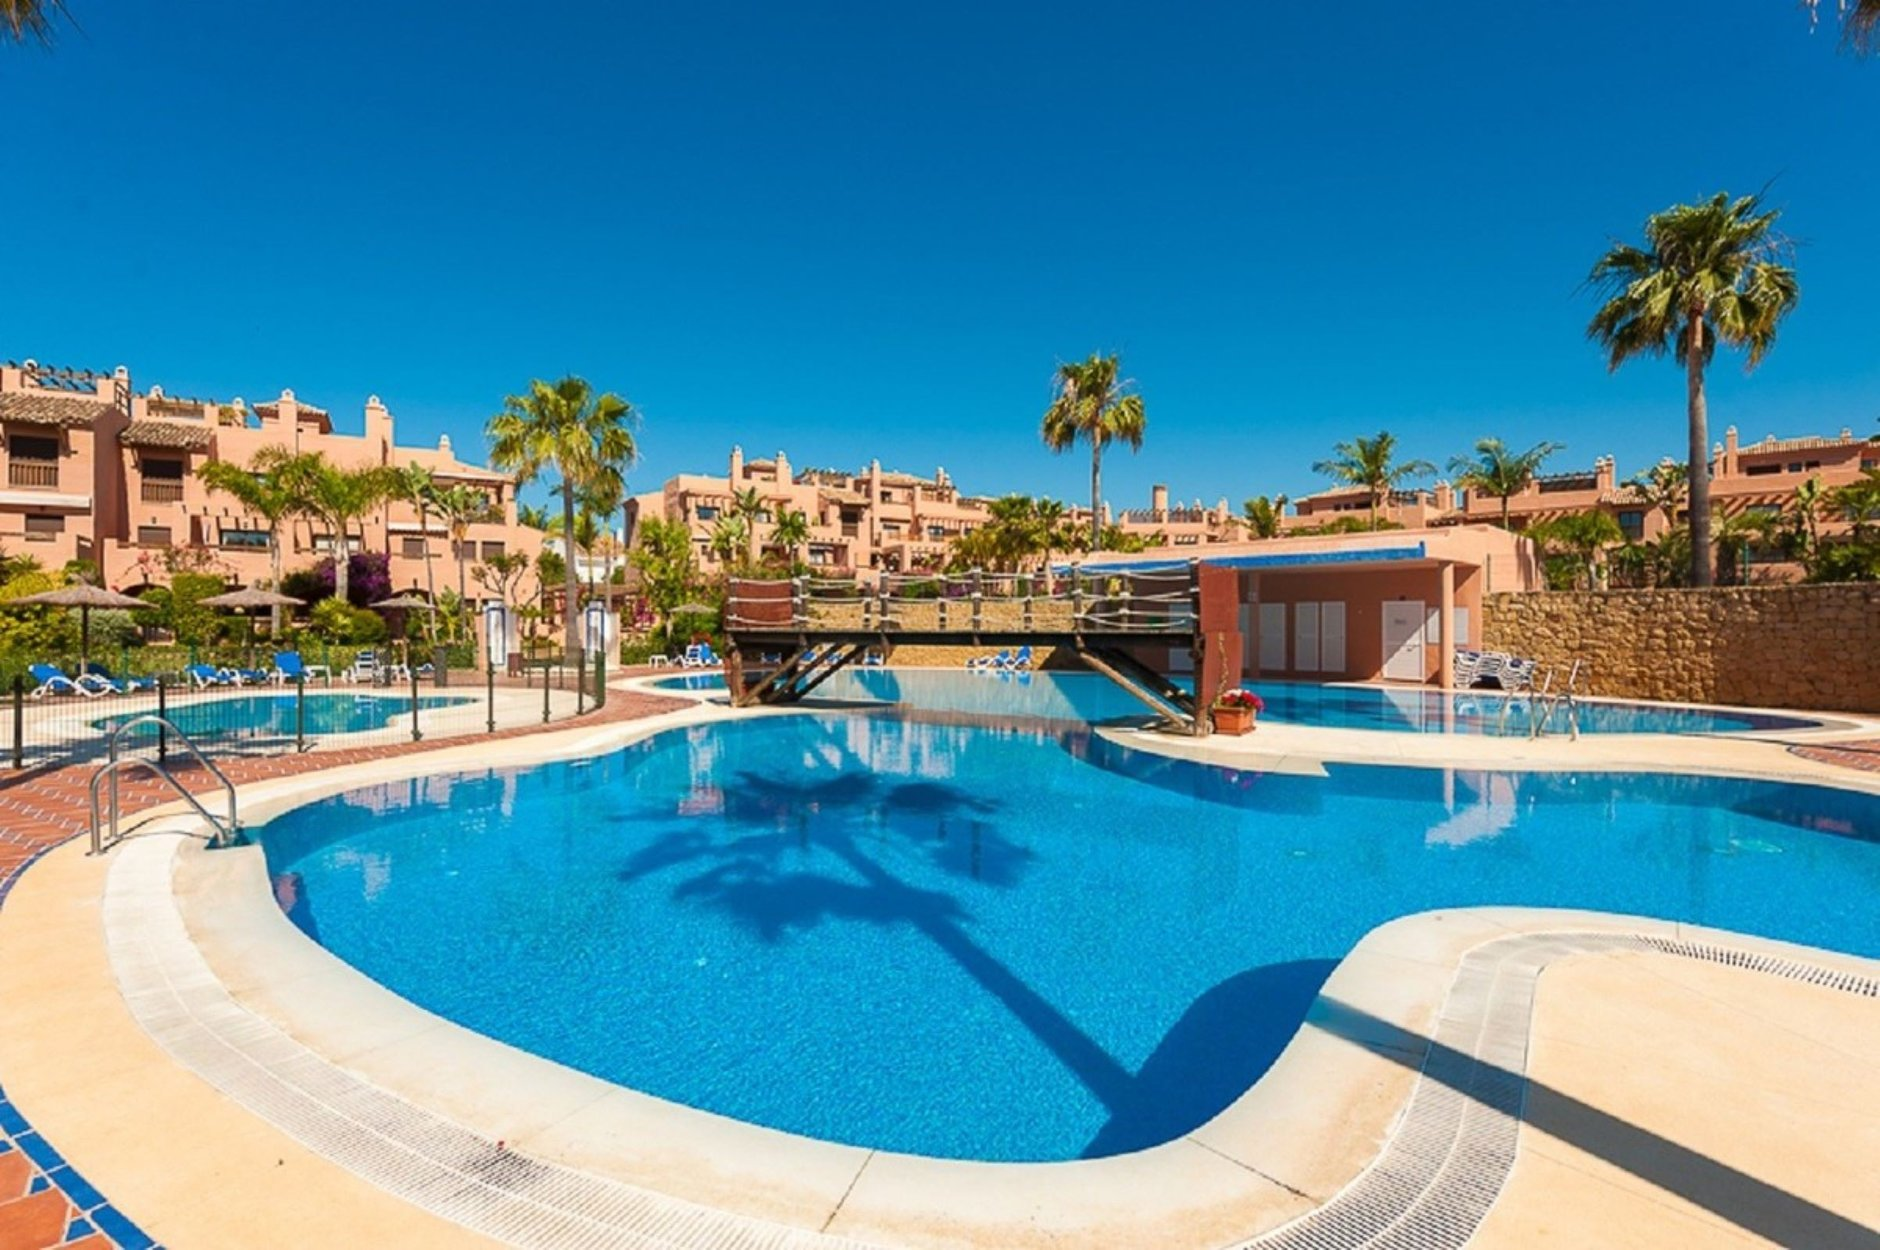 Penthouse for rent in Estepona - Málaga